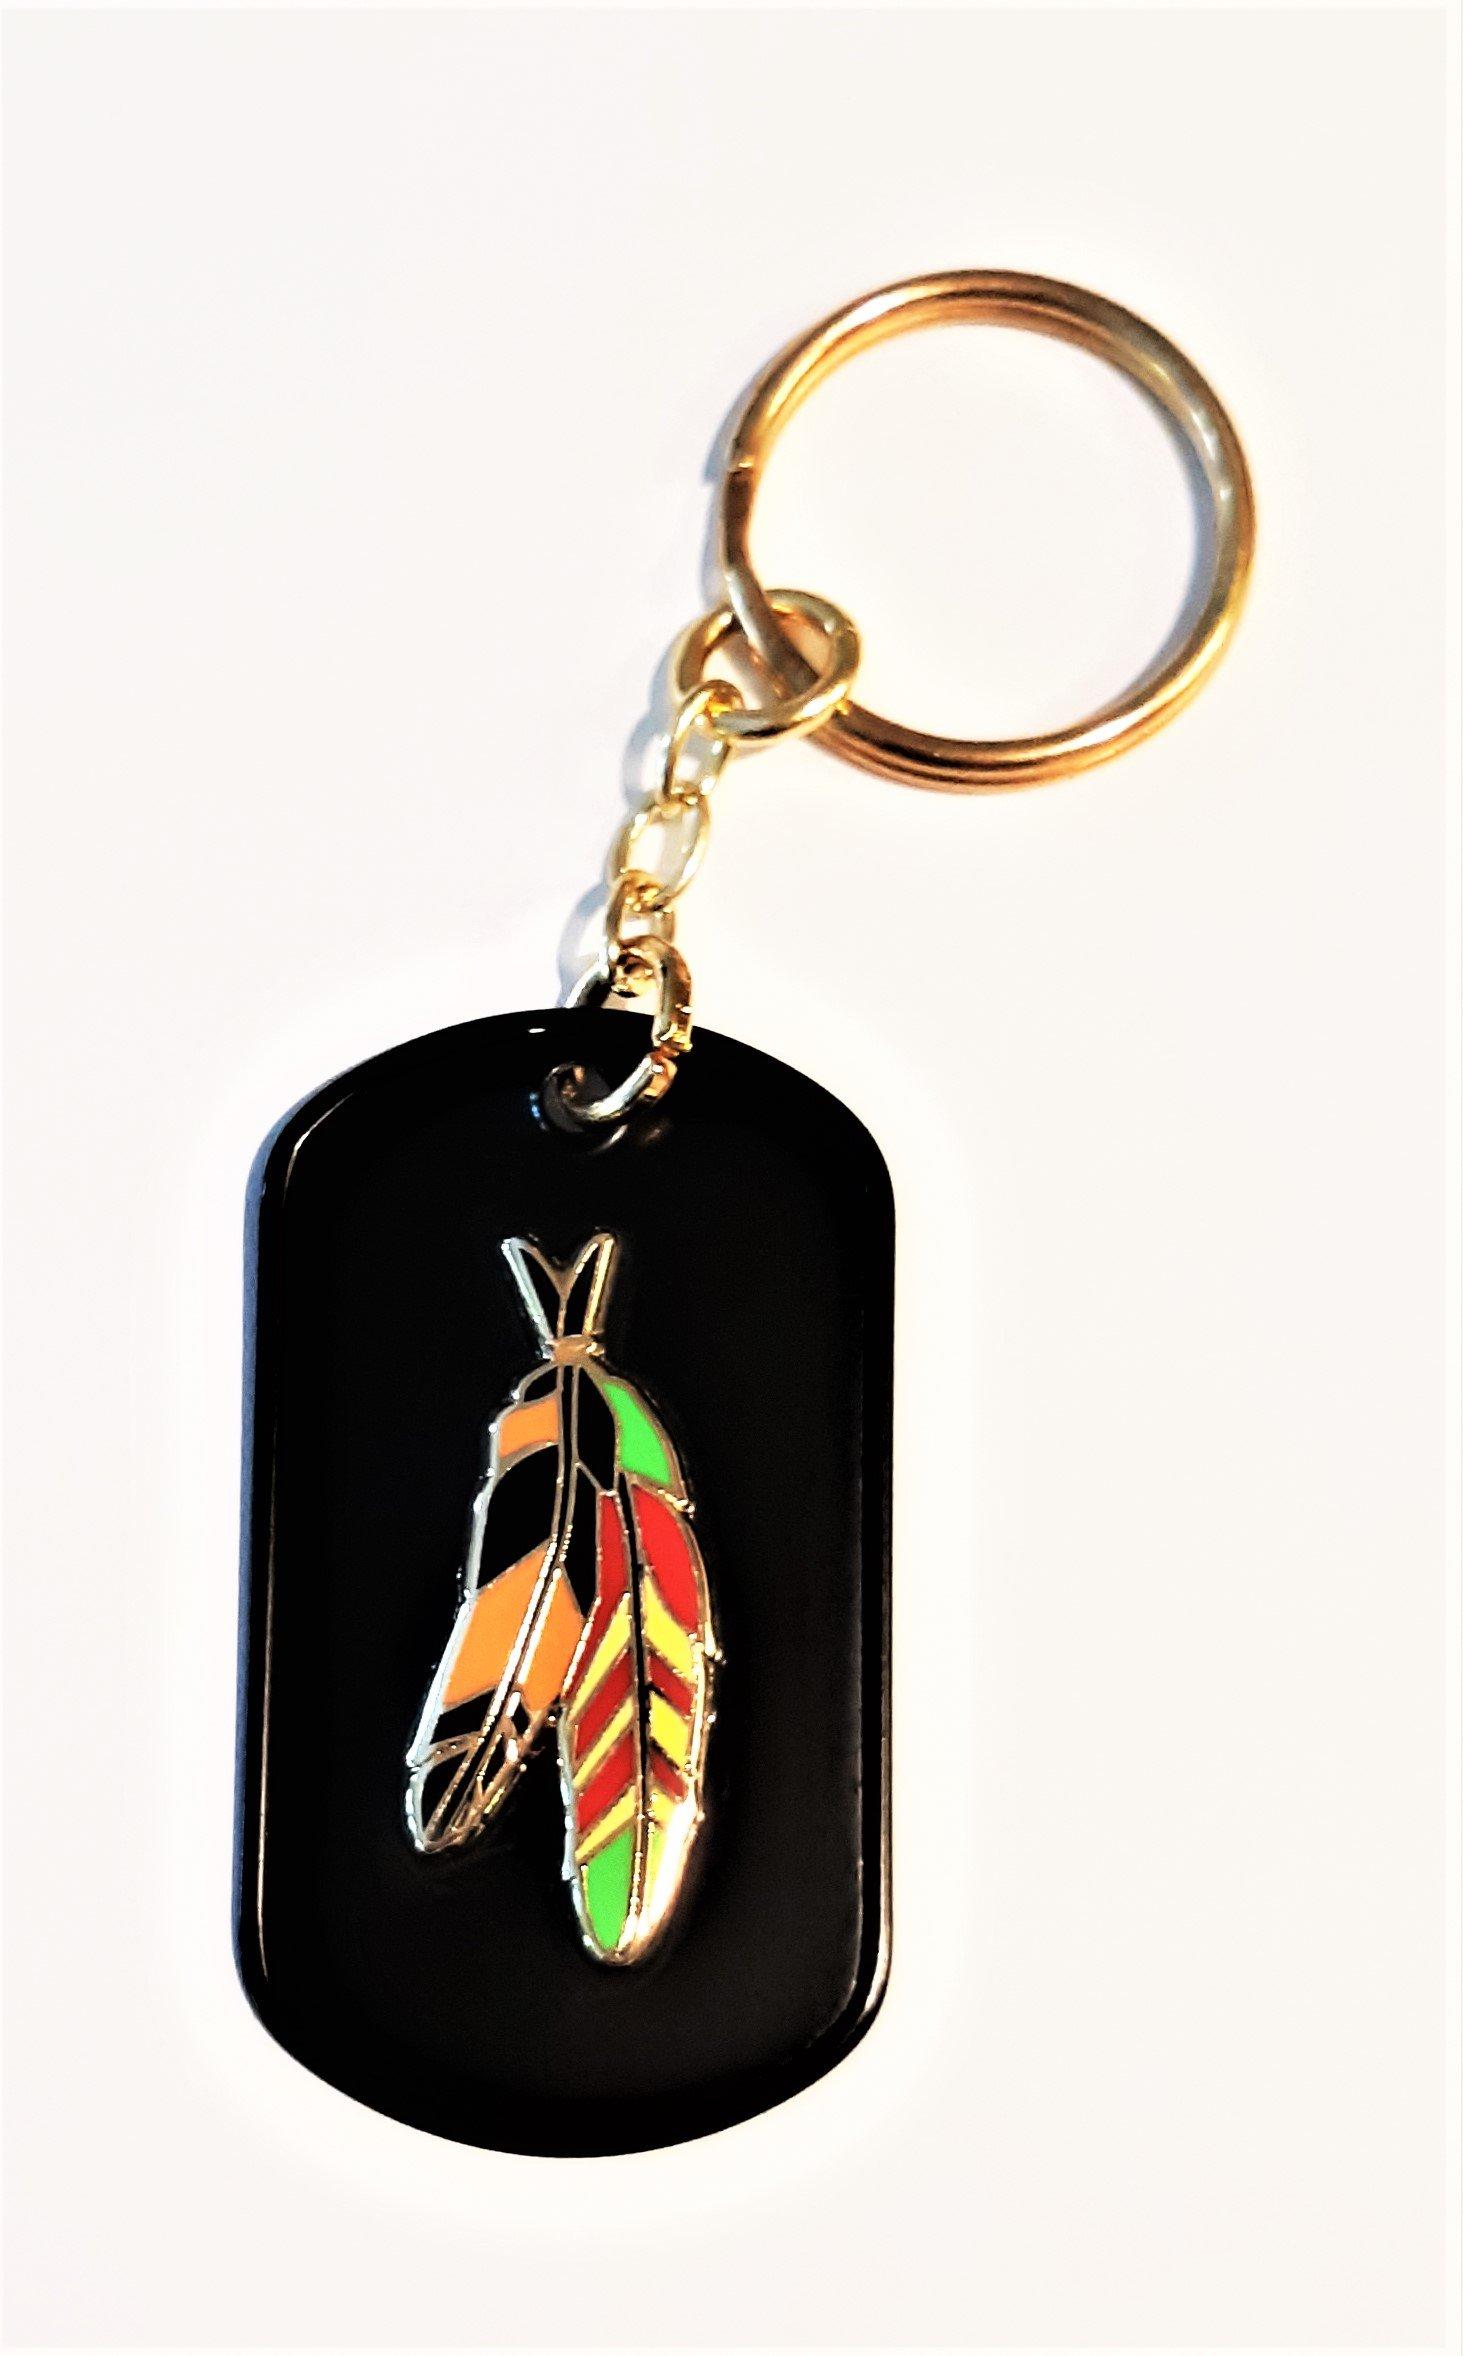 Image of Vietnam Veteran  Agent Orange Warrior Feathers Black Dog Tag Key Ring